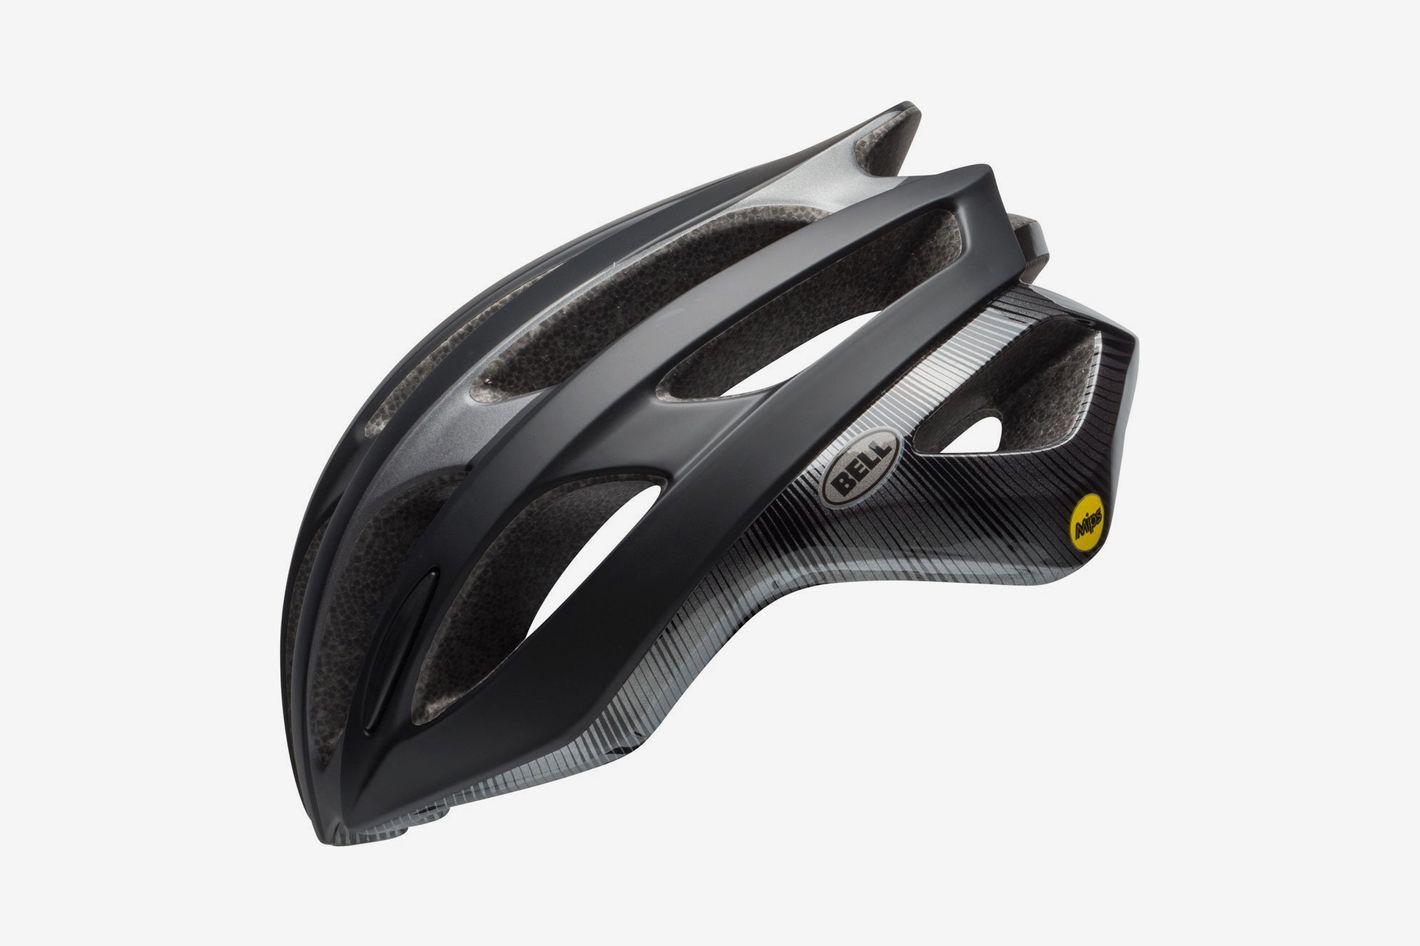 577b46090b6 Bell Falcon MIPS Bike Helmet at Amazon